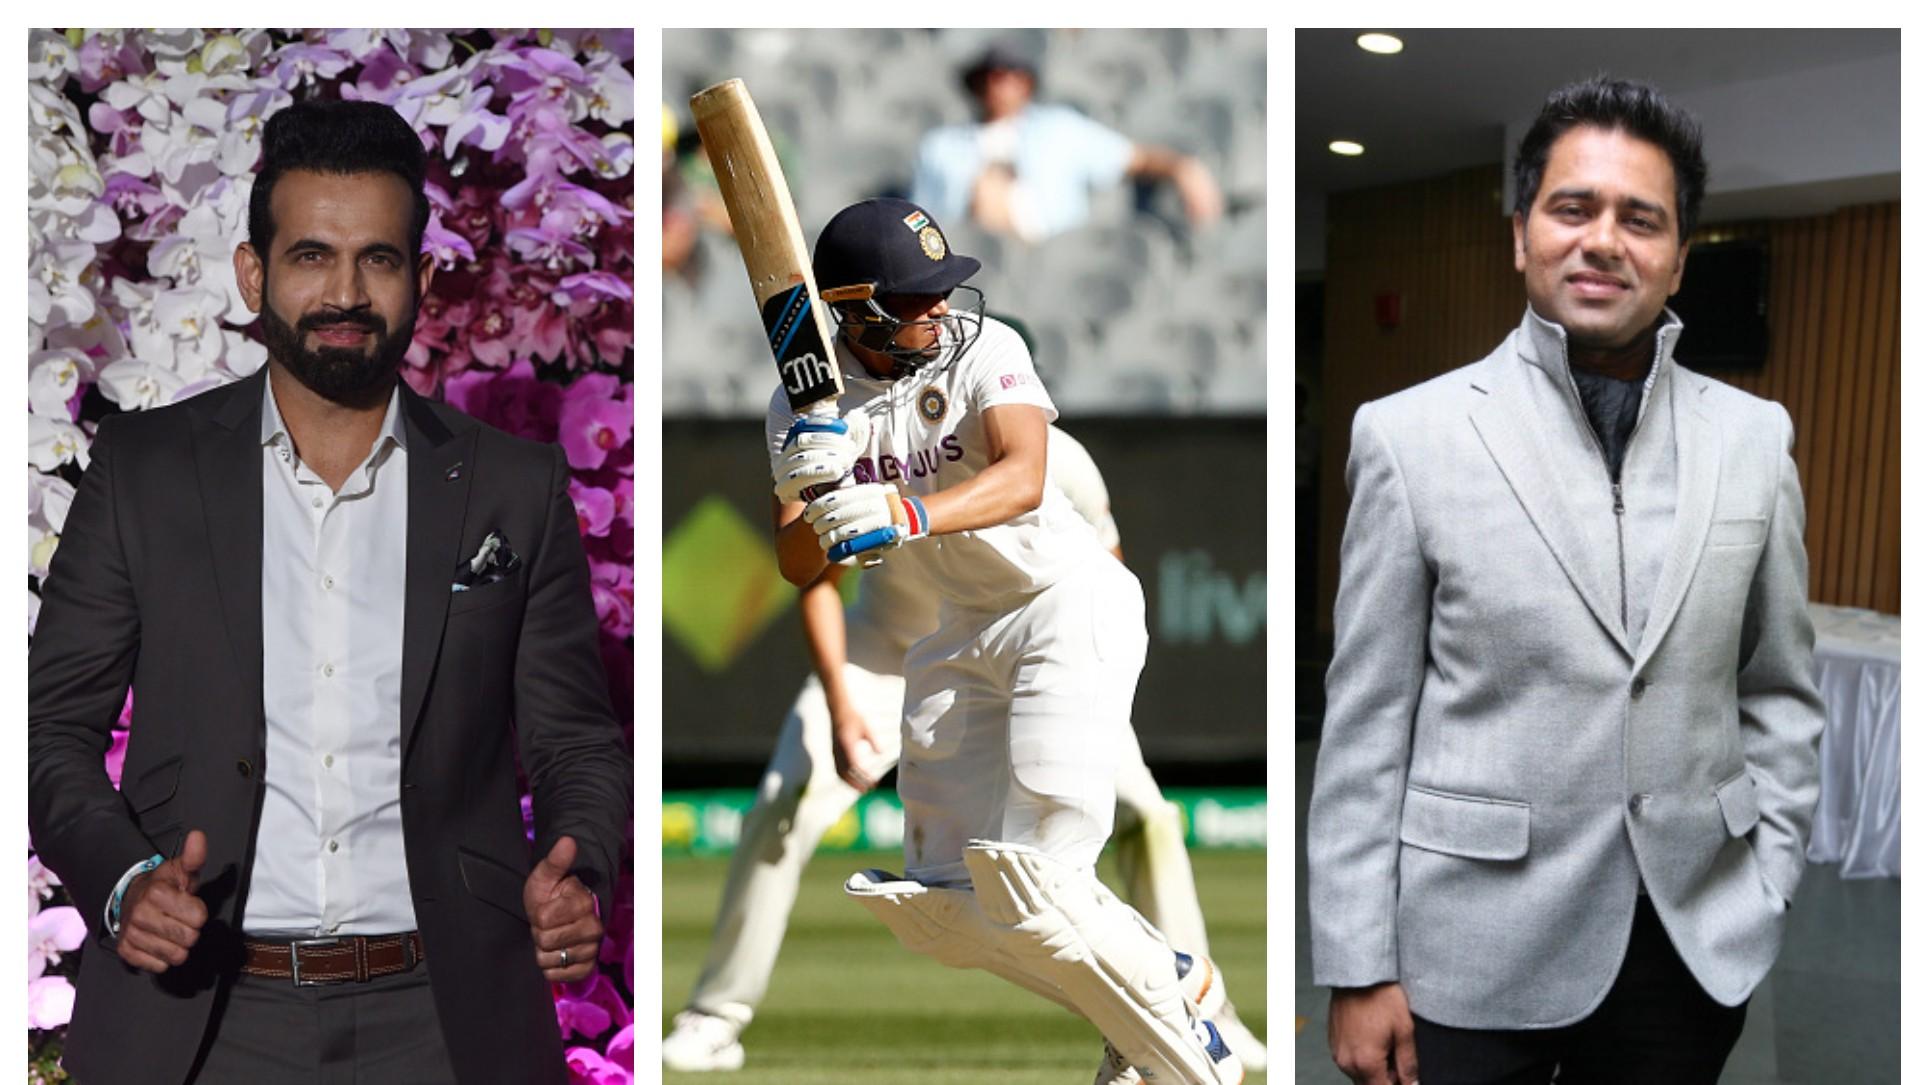 AUS v IND 2020-21: Cricket fraternity praises Shubman Gill as he looks solid on Test debutat MCG